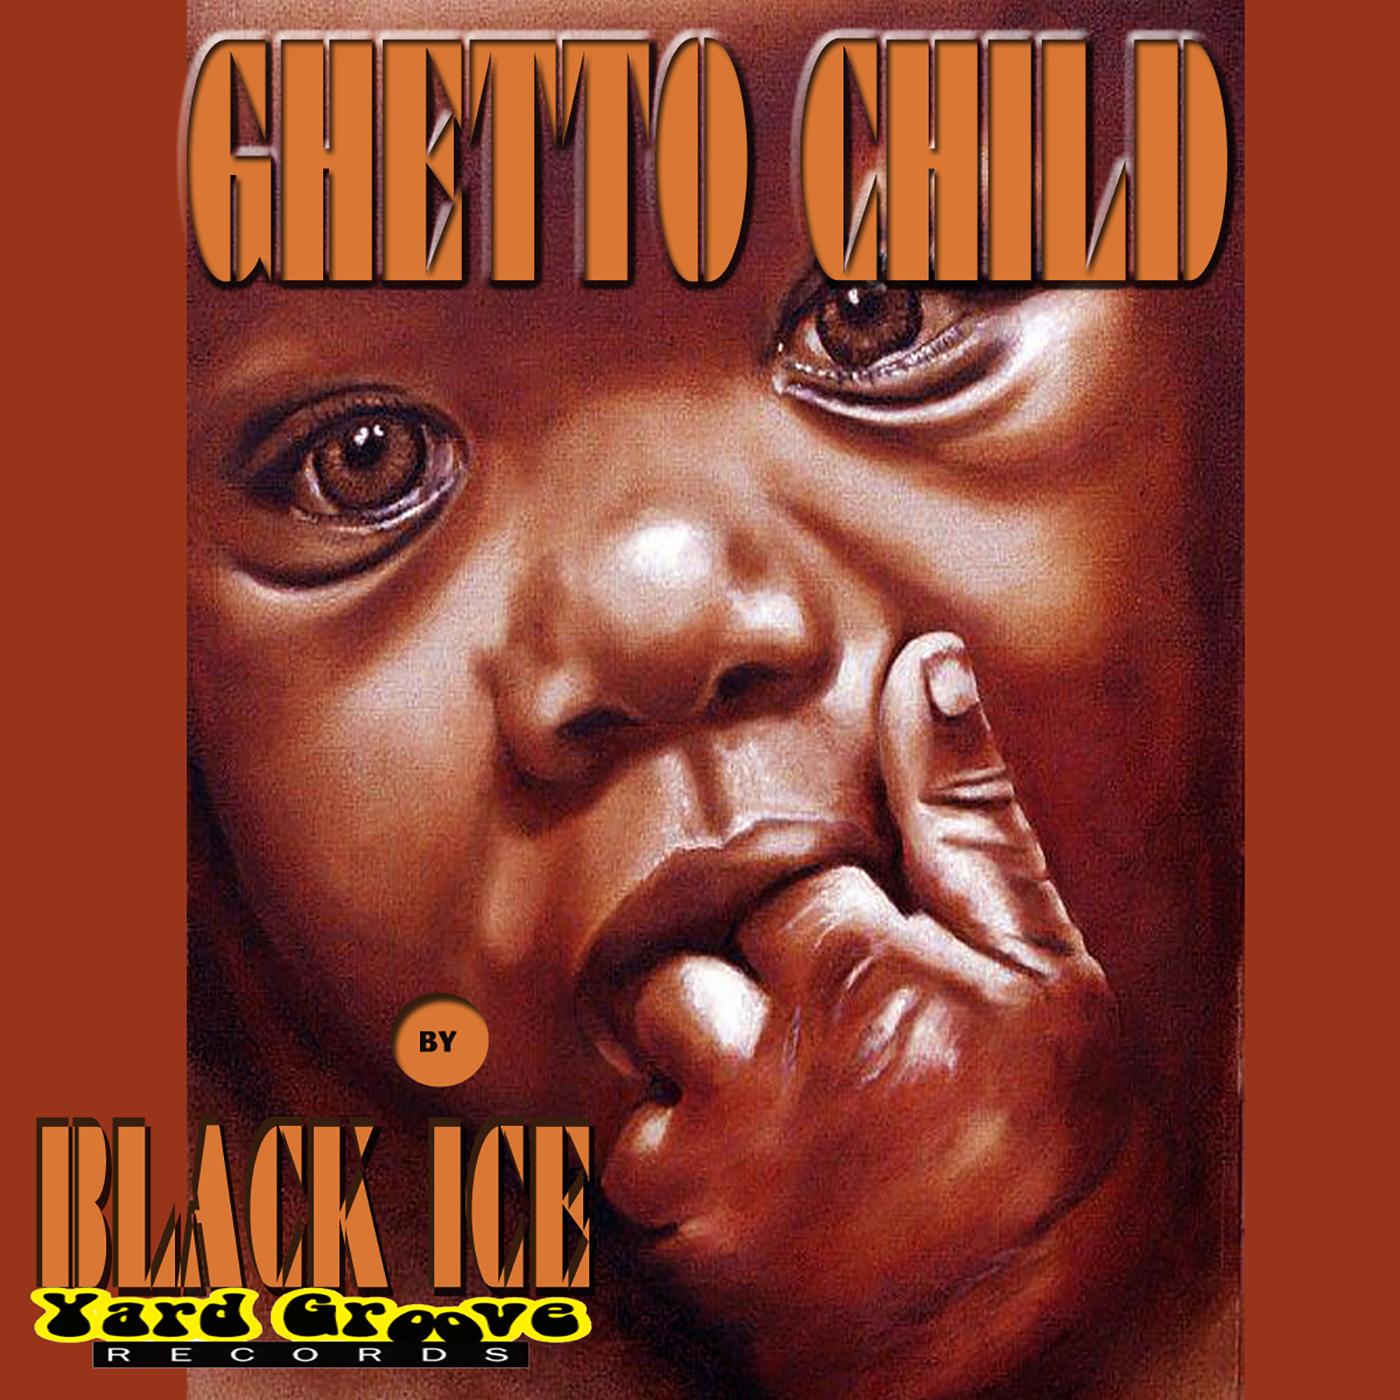 https://0201.nccdn.net/4_2/000/000/038/2d3/283405-ghetto_child.jpg